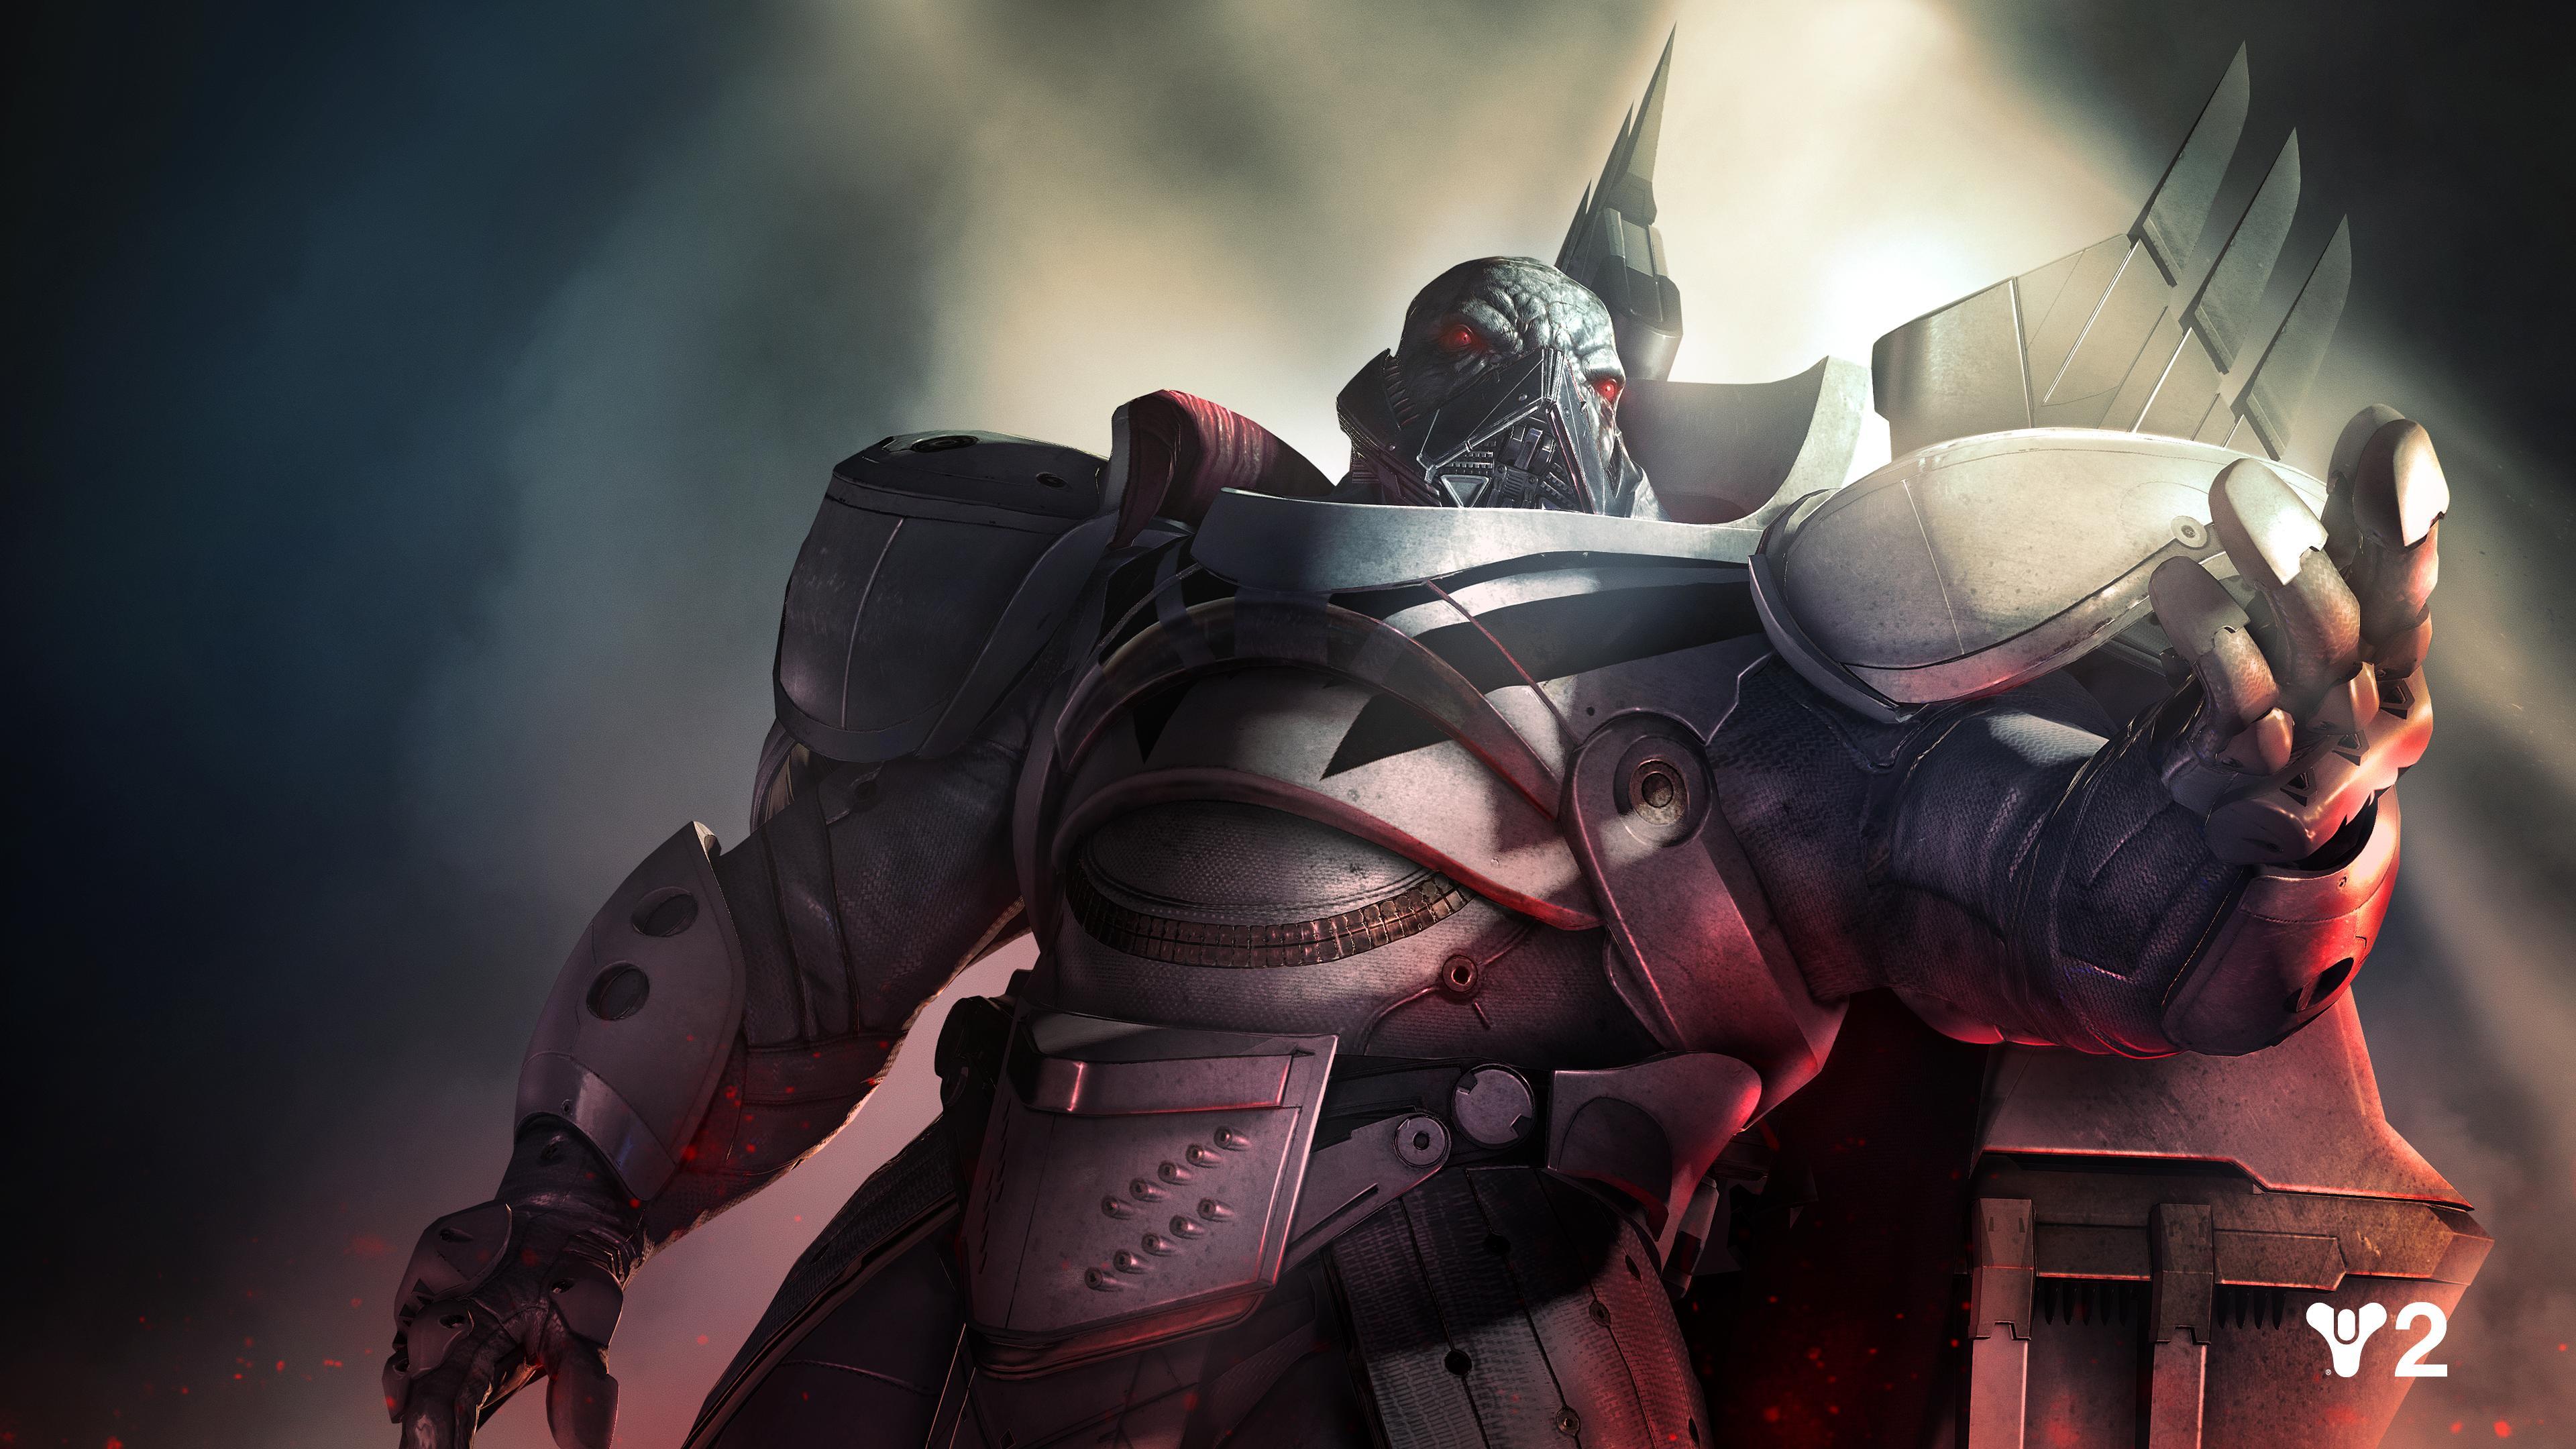 Destiny 2 Ghaul, HD Games, 4k Wallpapers, Images ...